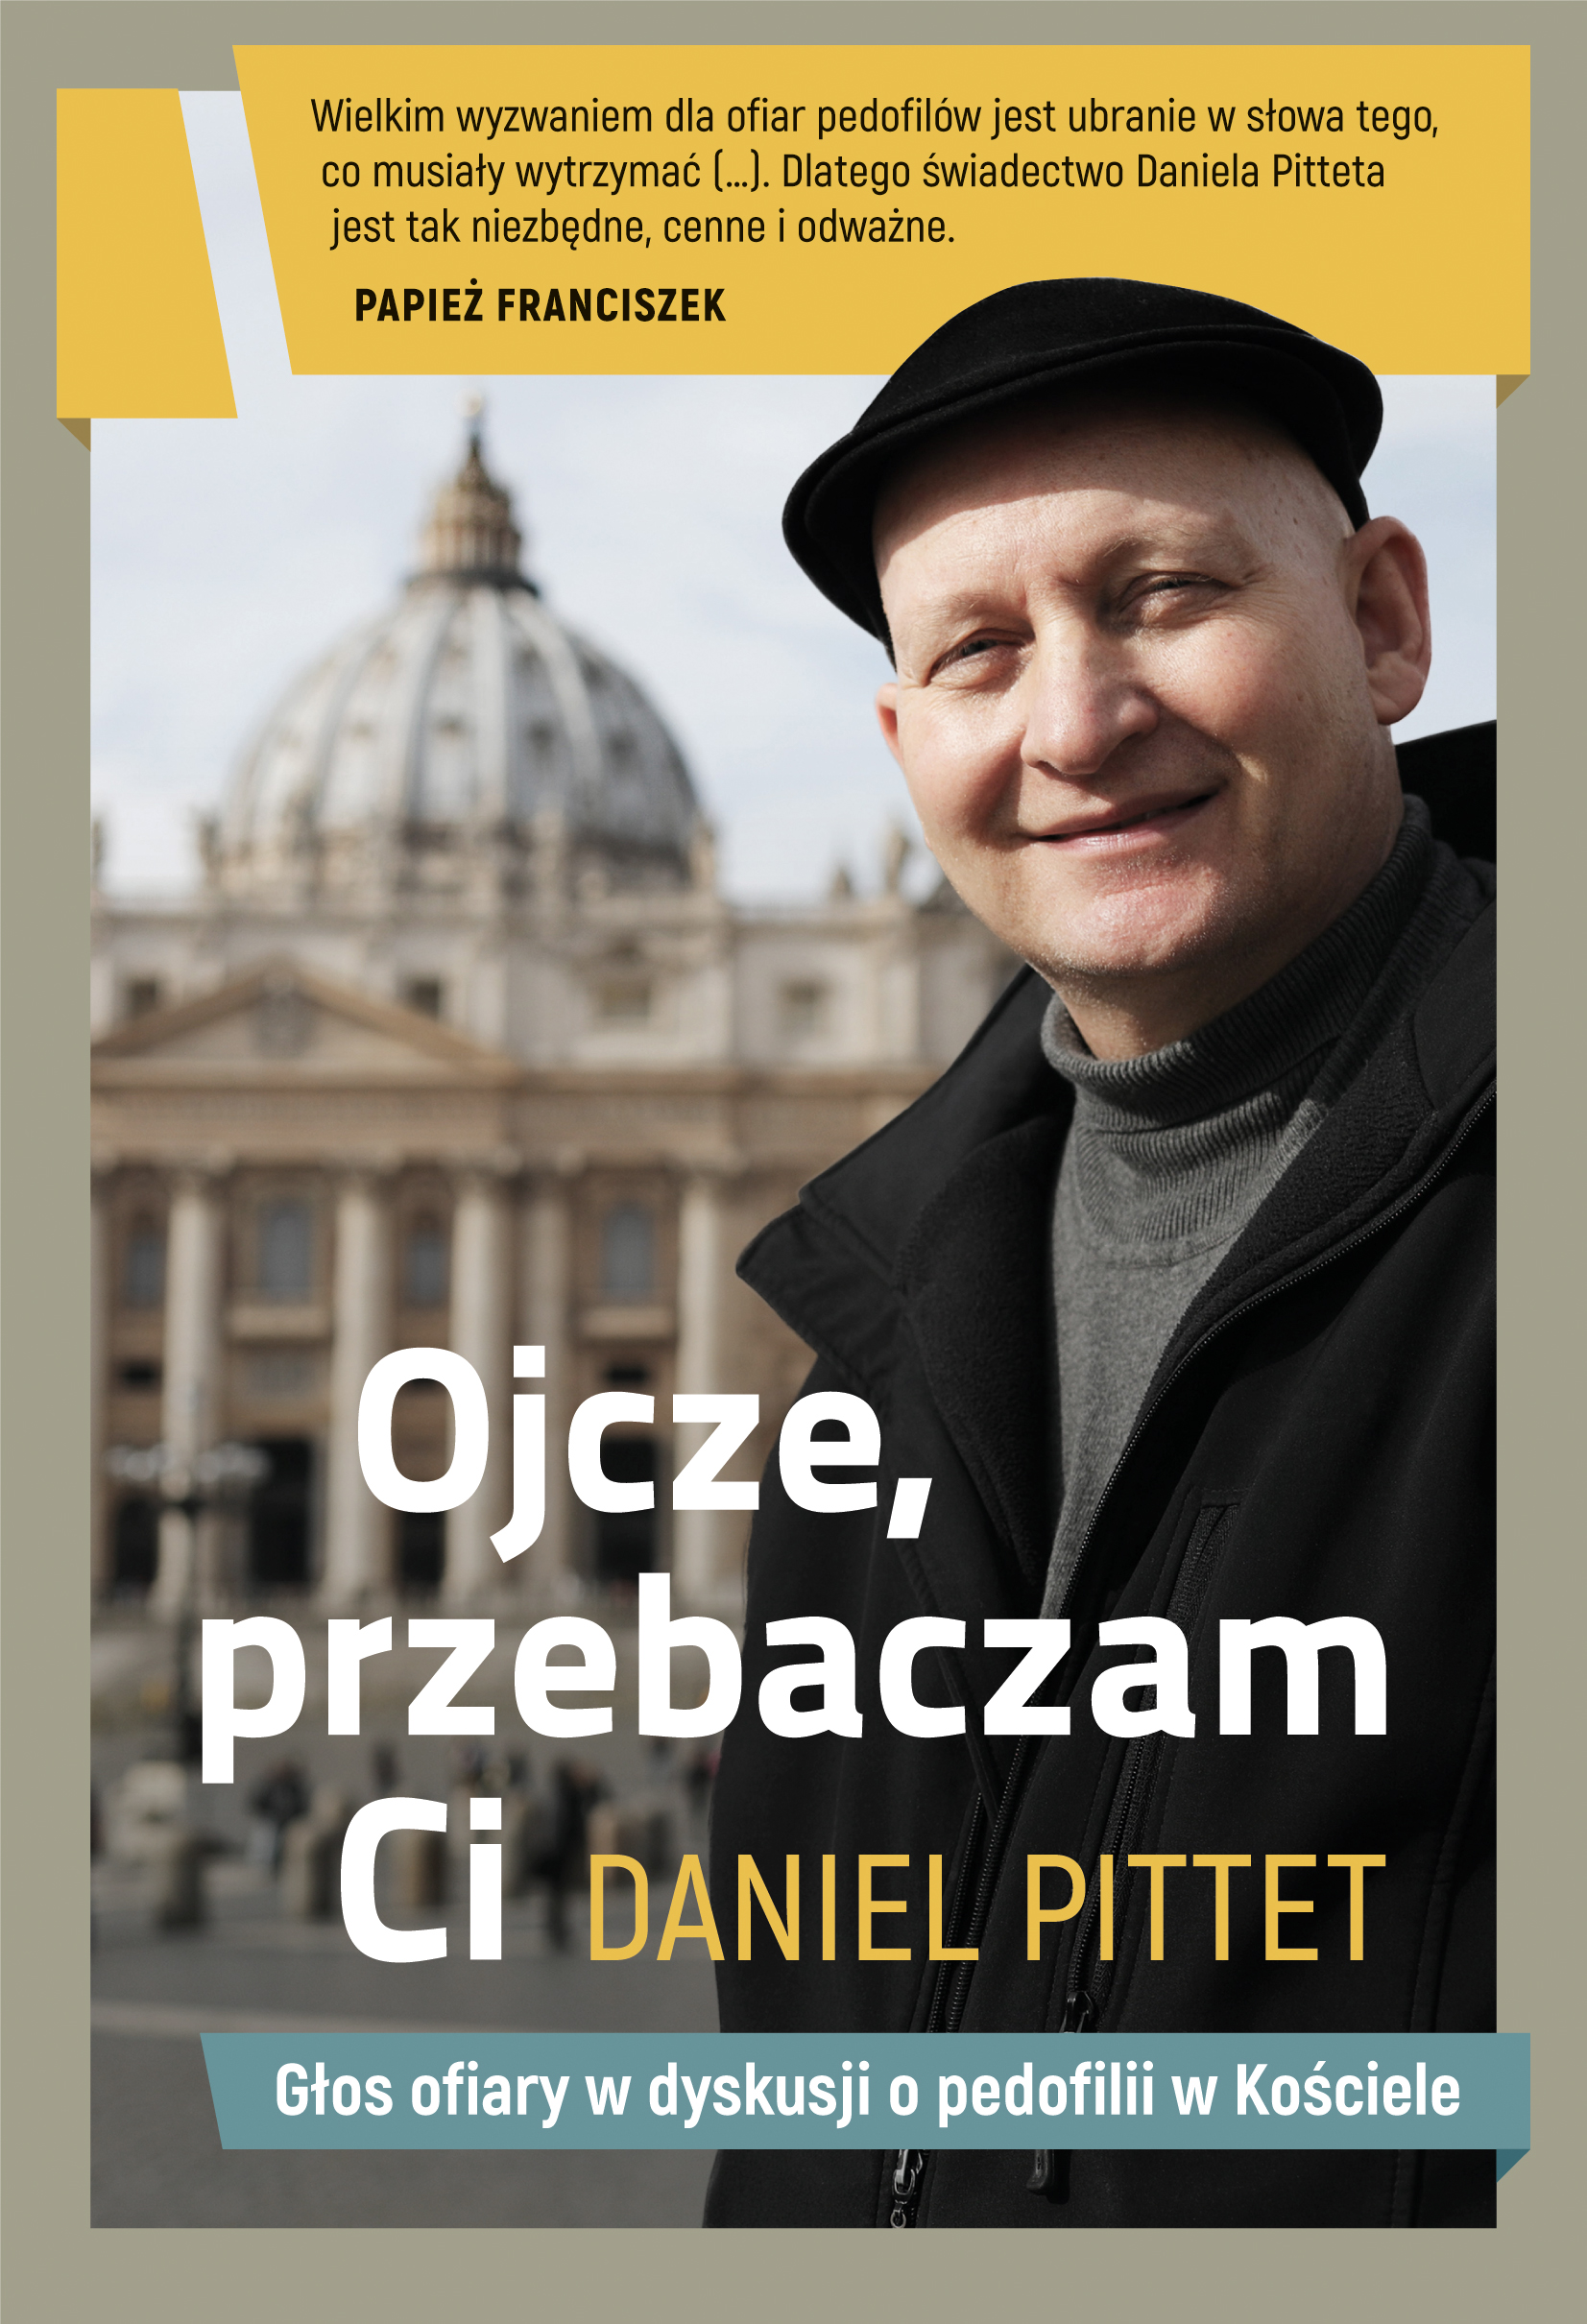 DANIEL PITTET, OFIARA PEDOFILII